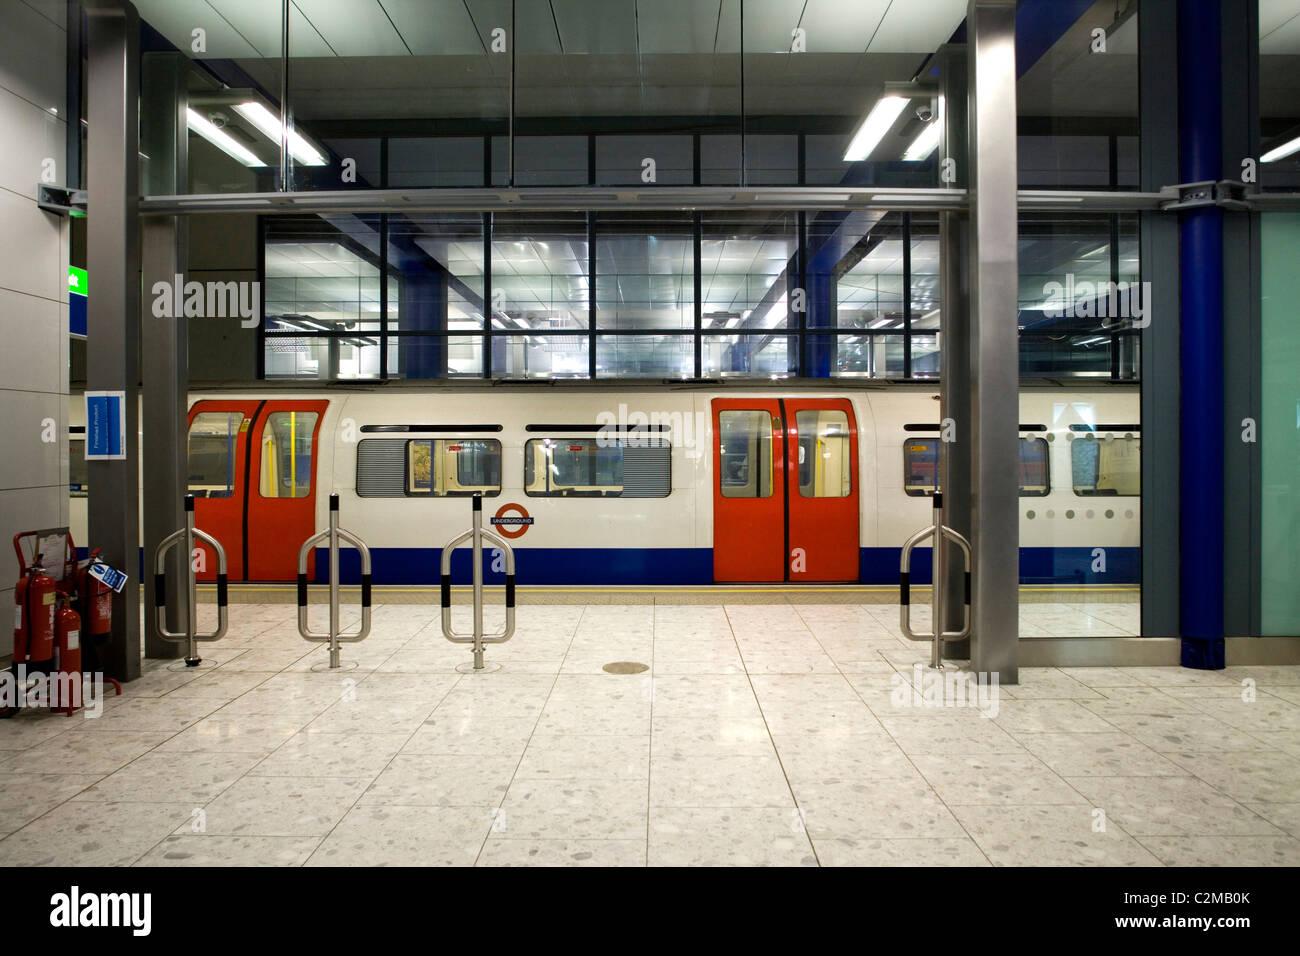 BAA, T5, Terminal 5, Heathrow Airport, London. - Stock Image